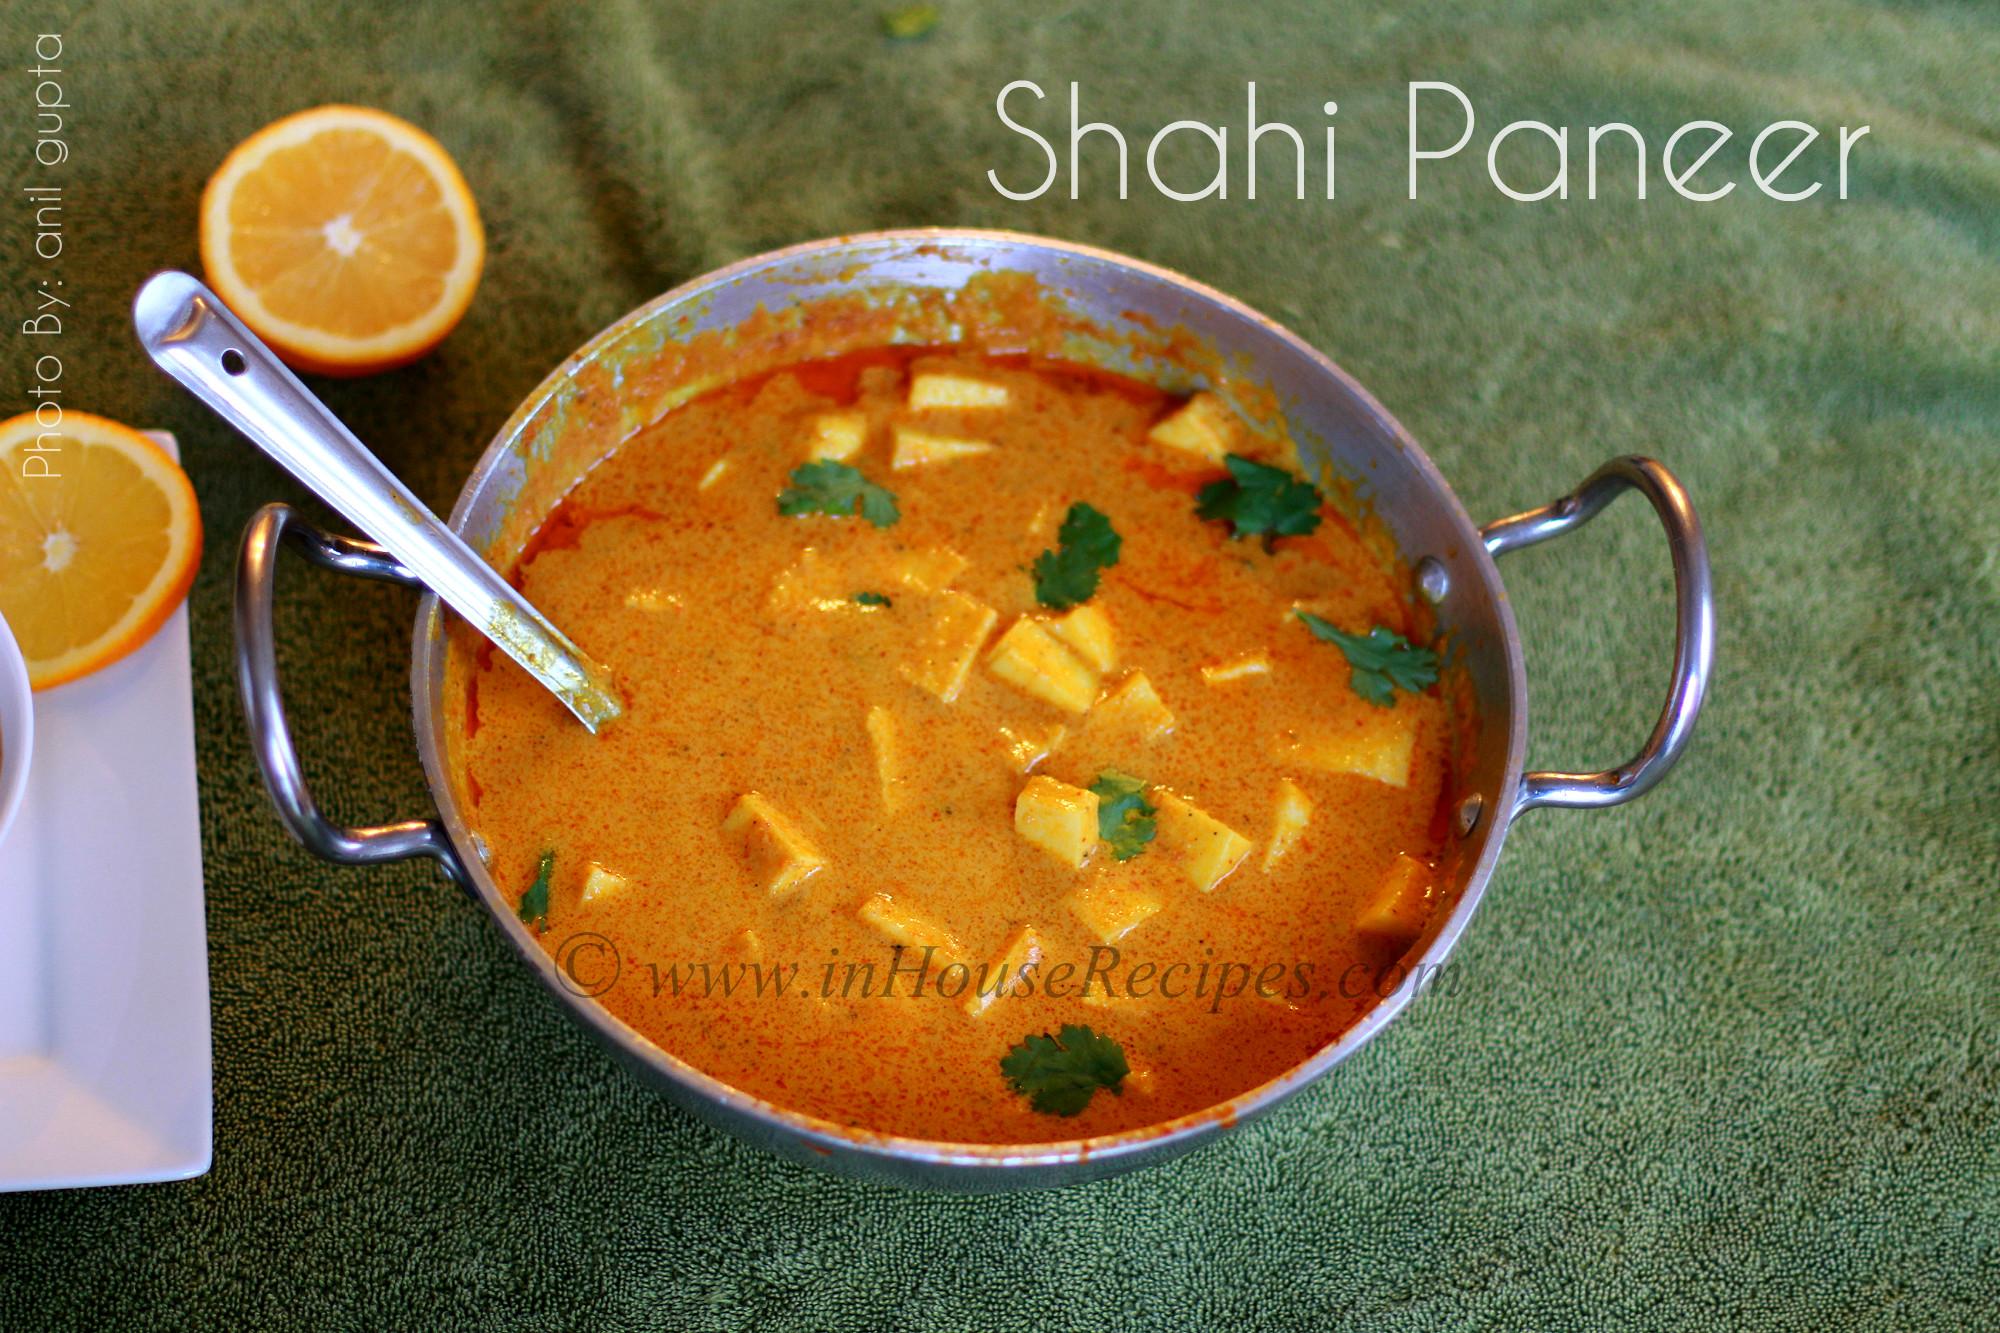 Shahi paneer recipe restaurant style sunset color inhouserecipes shahi paneer at home forumfinder Gallery